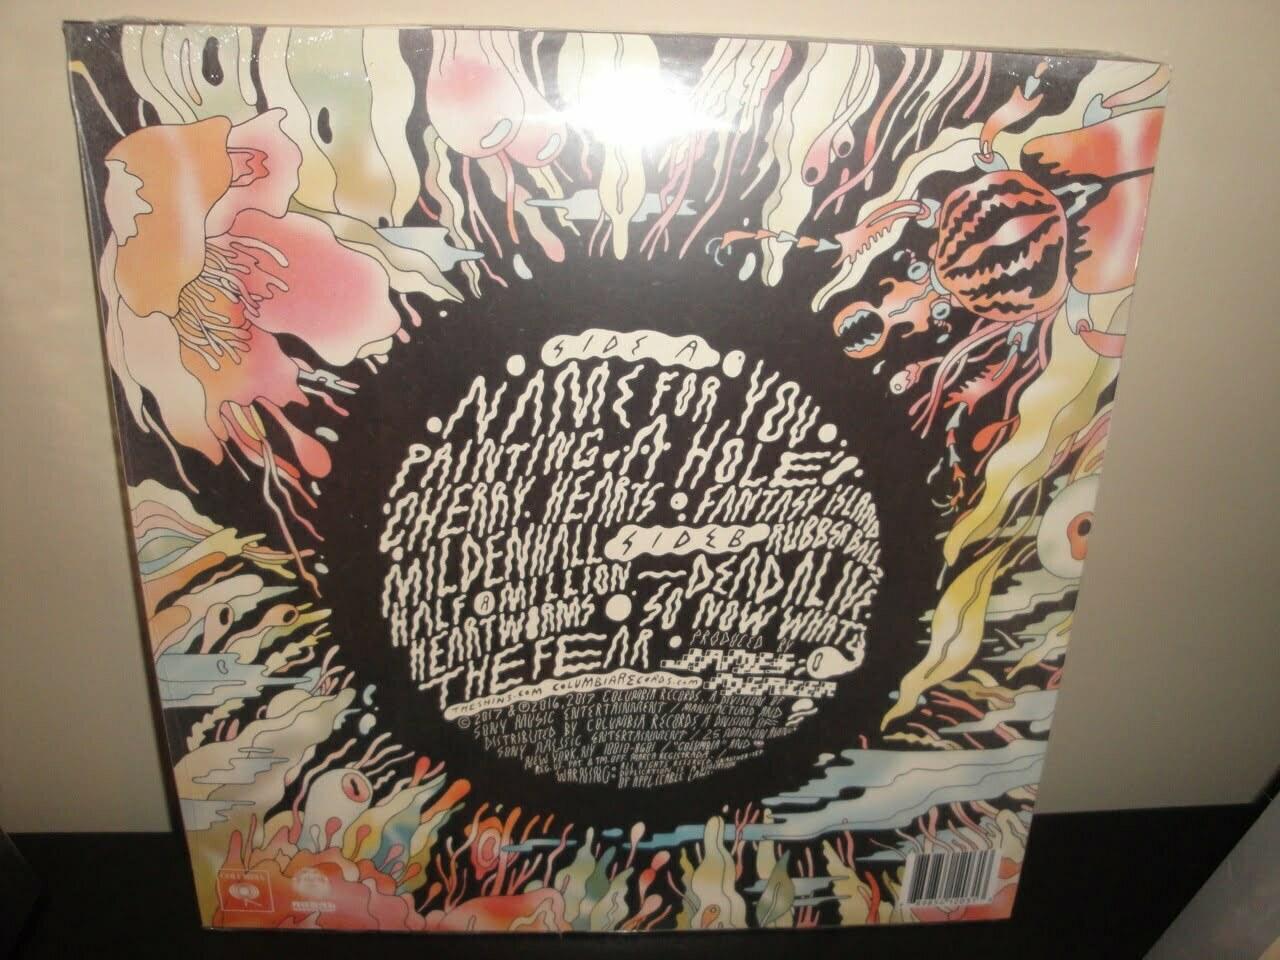 The Shins - Heartworms - 180 Gram Vinyl LP, New 2017